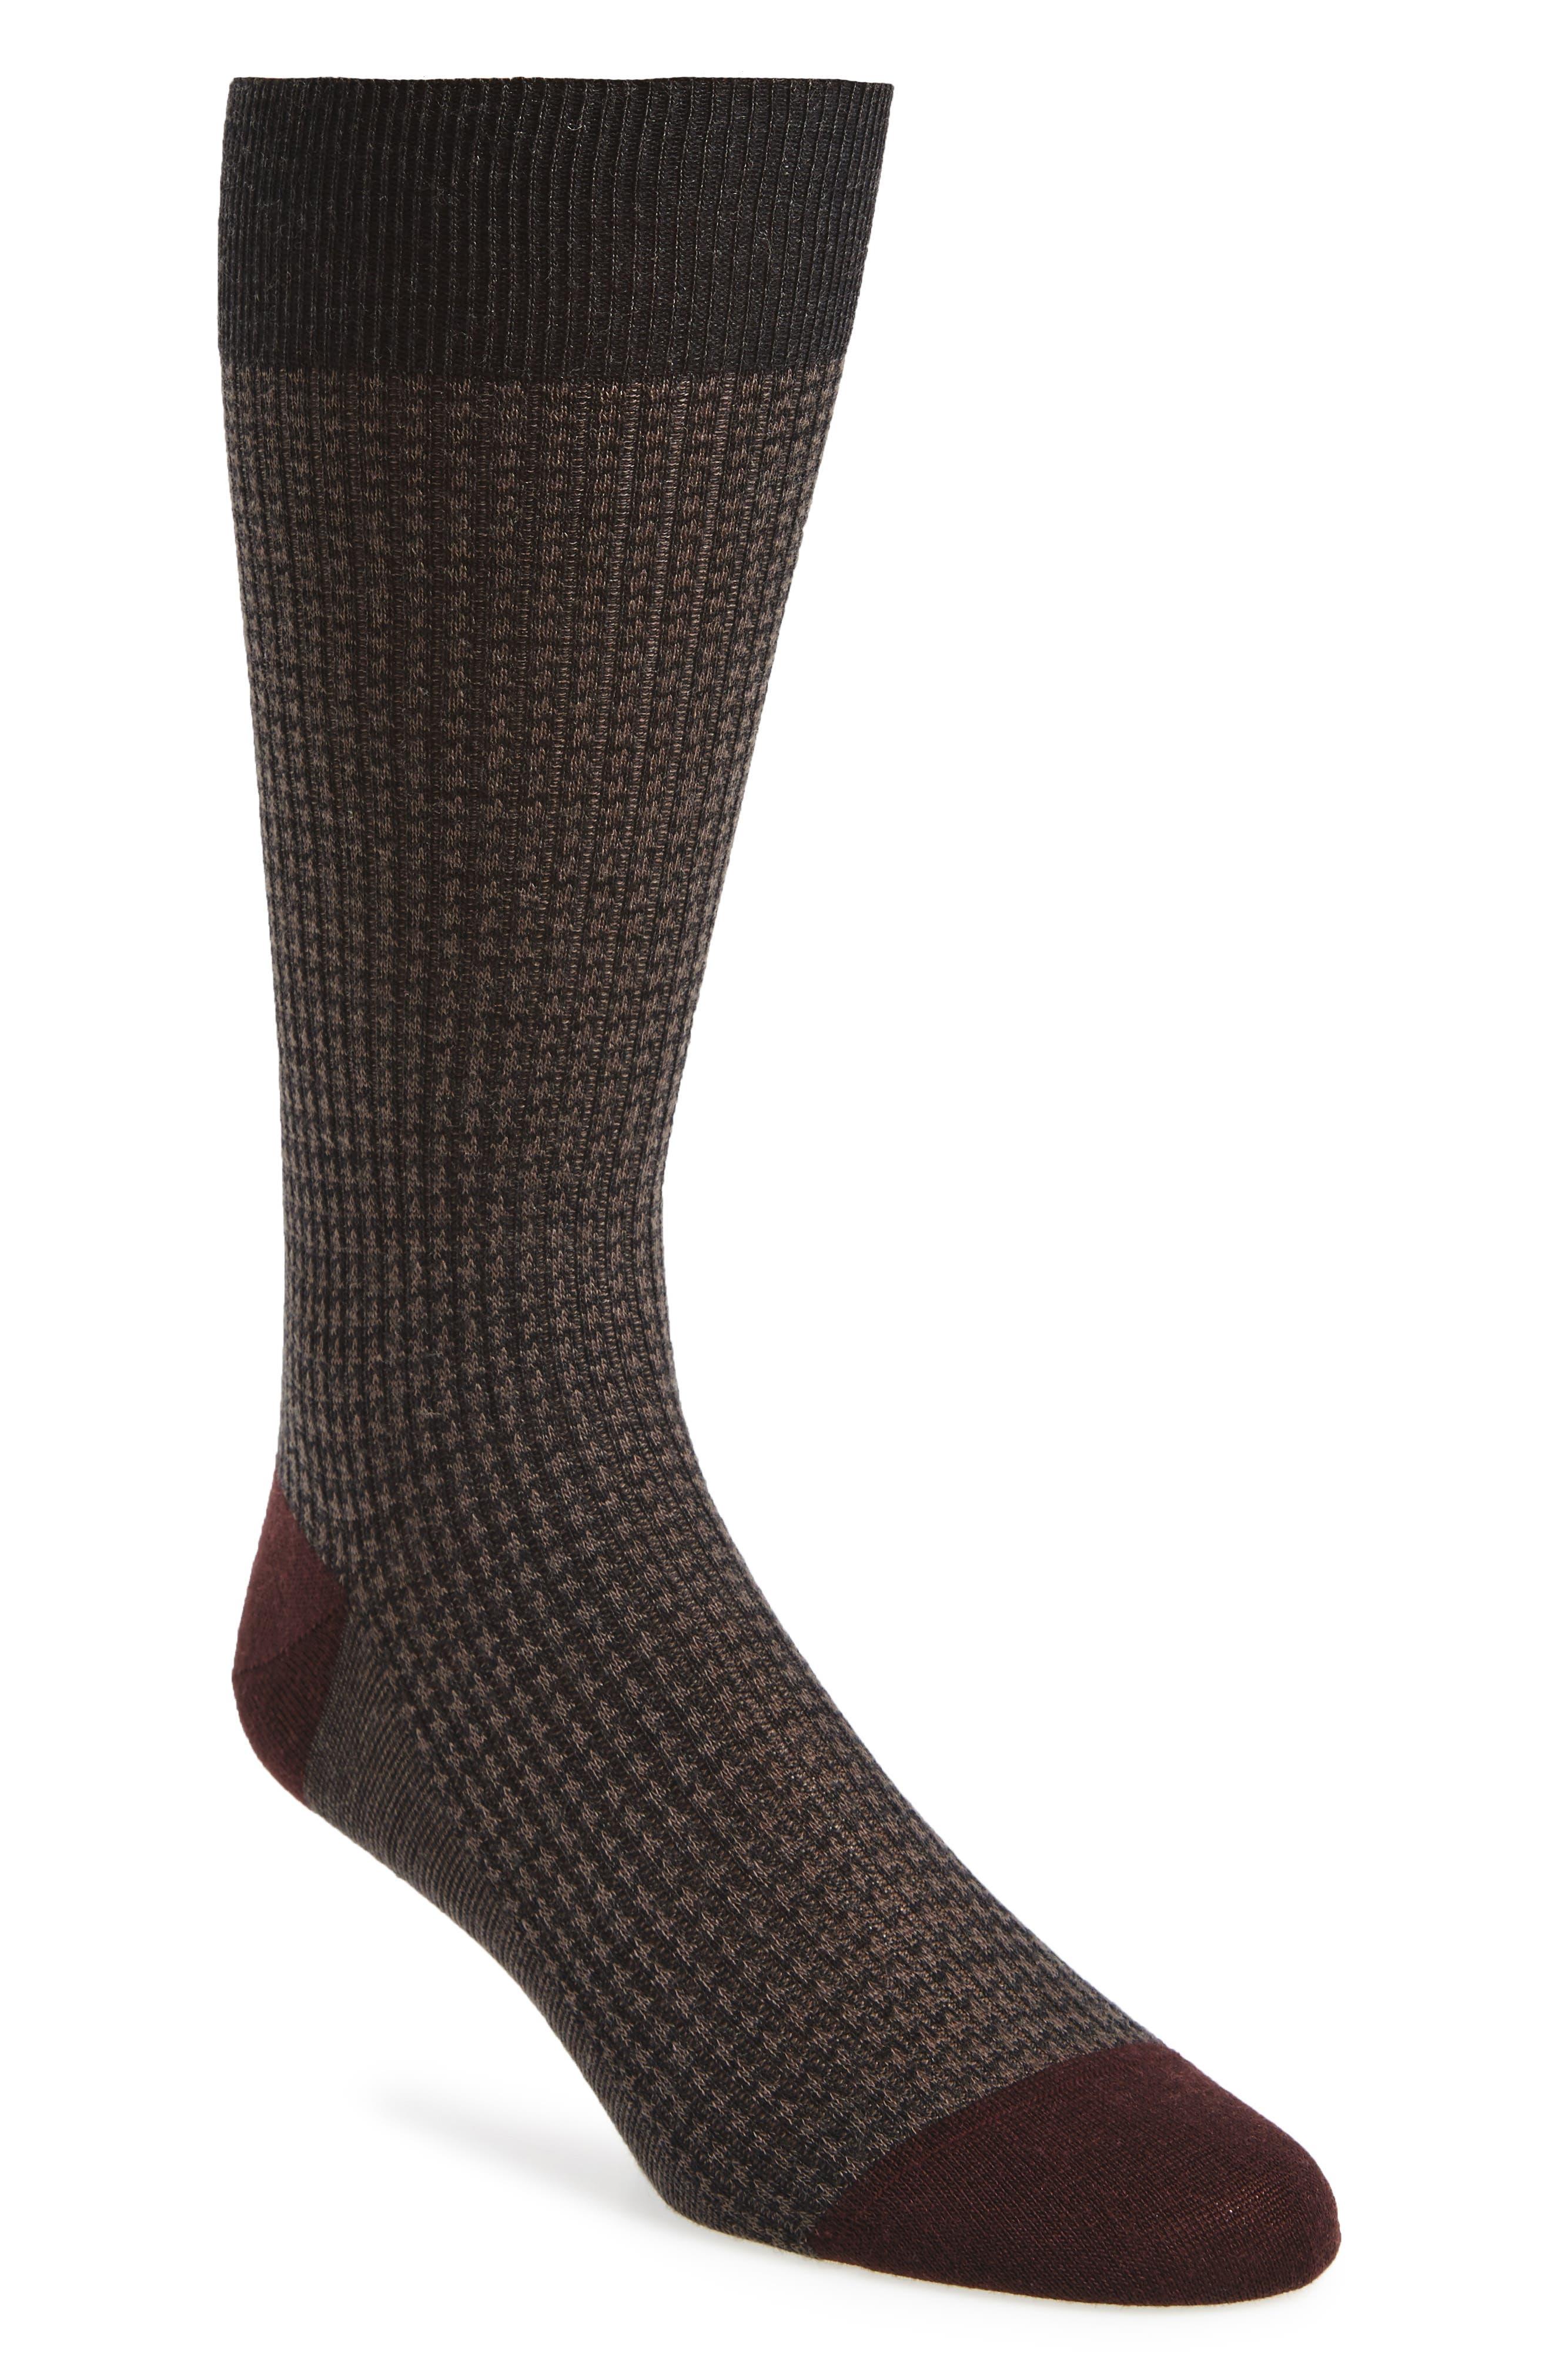 Alternate Image 1 Selected - Pantherella Houndstooth Wool Blend Socks